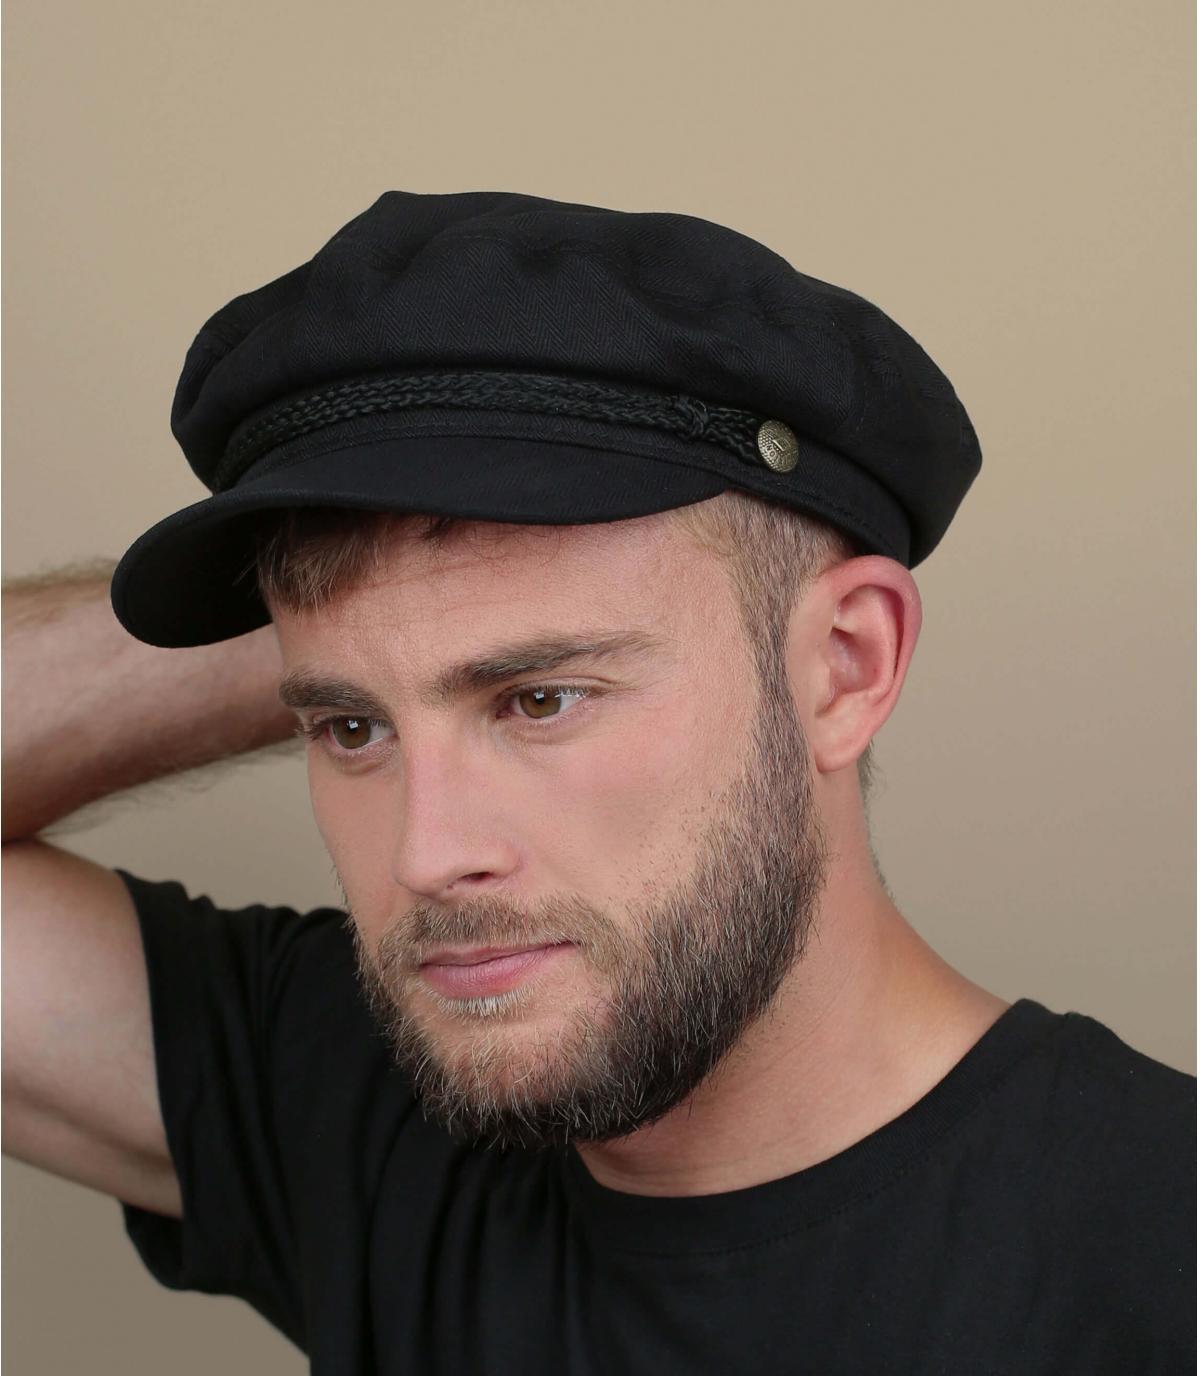 Sailors cap men